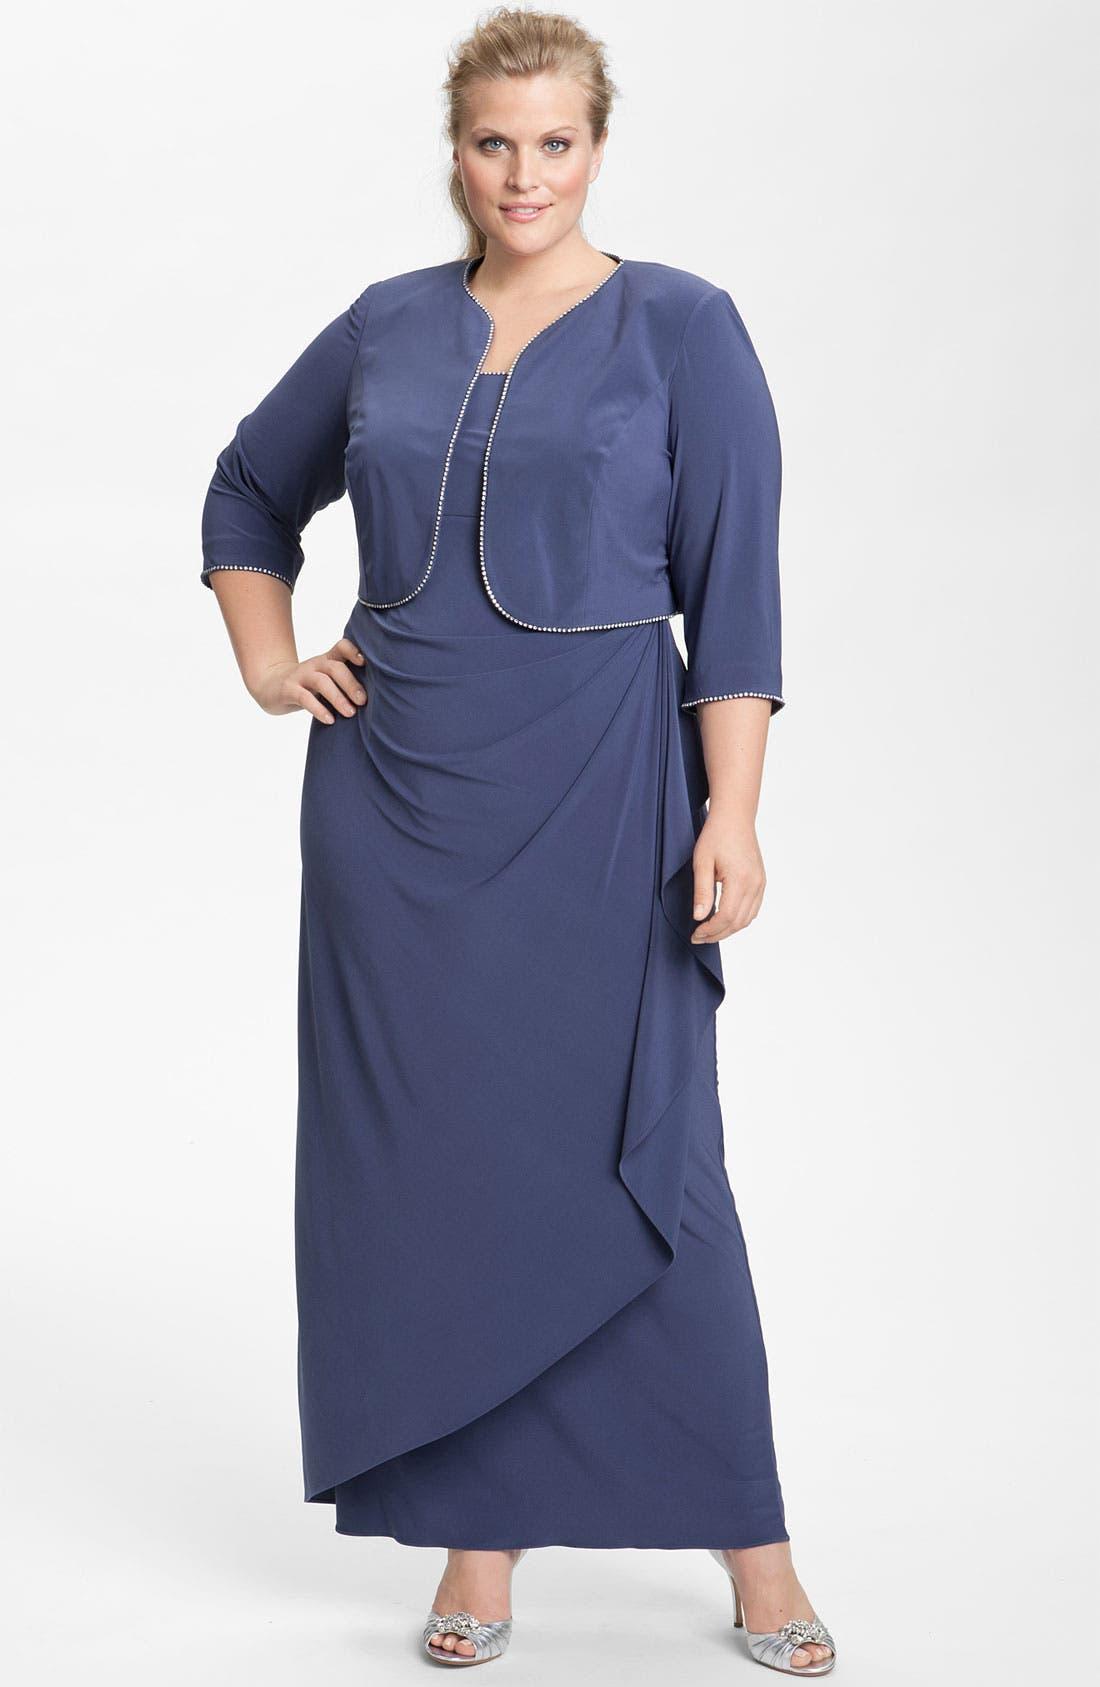 Main Image - Alex Evenings Rhinestone Jersey Dress & Bolero (Plus)